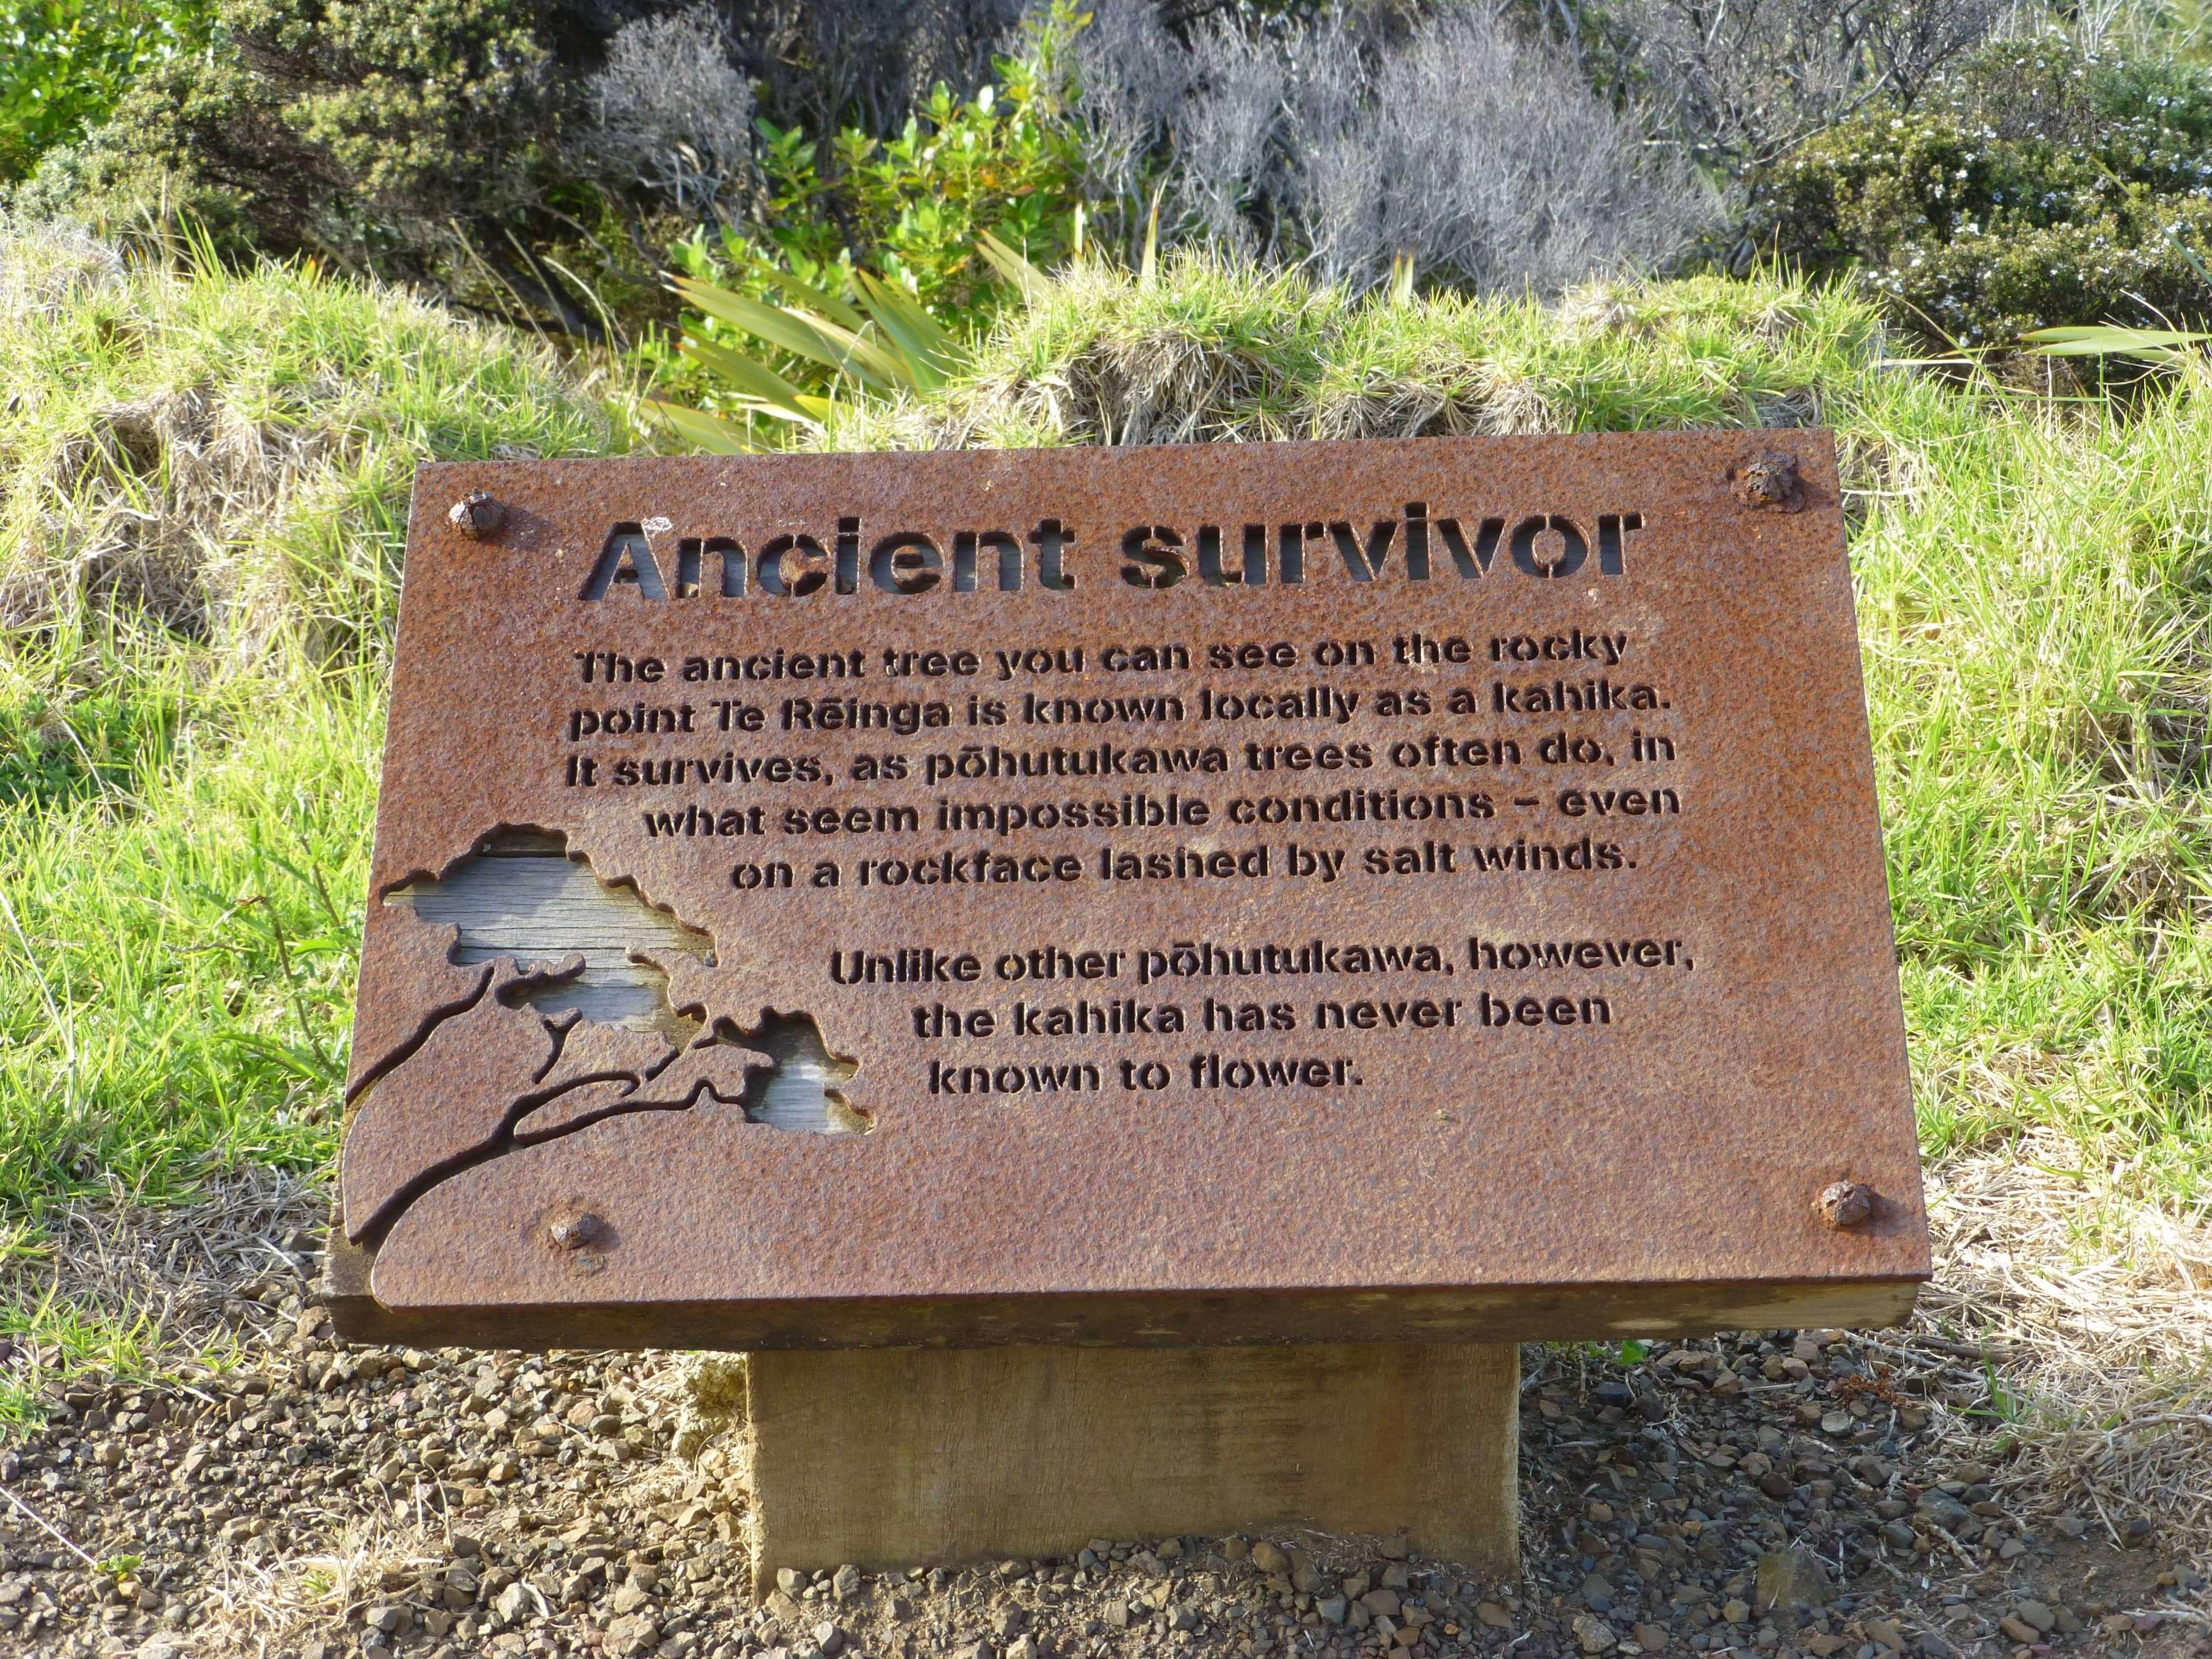 Ancient survivor, Cape Reinga 1